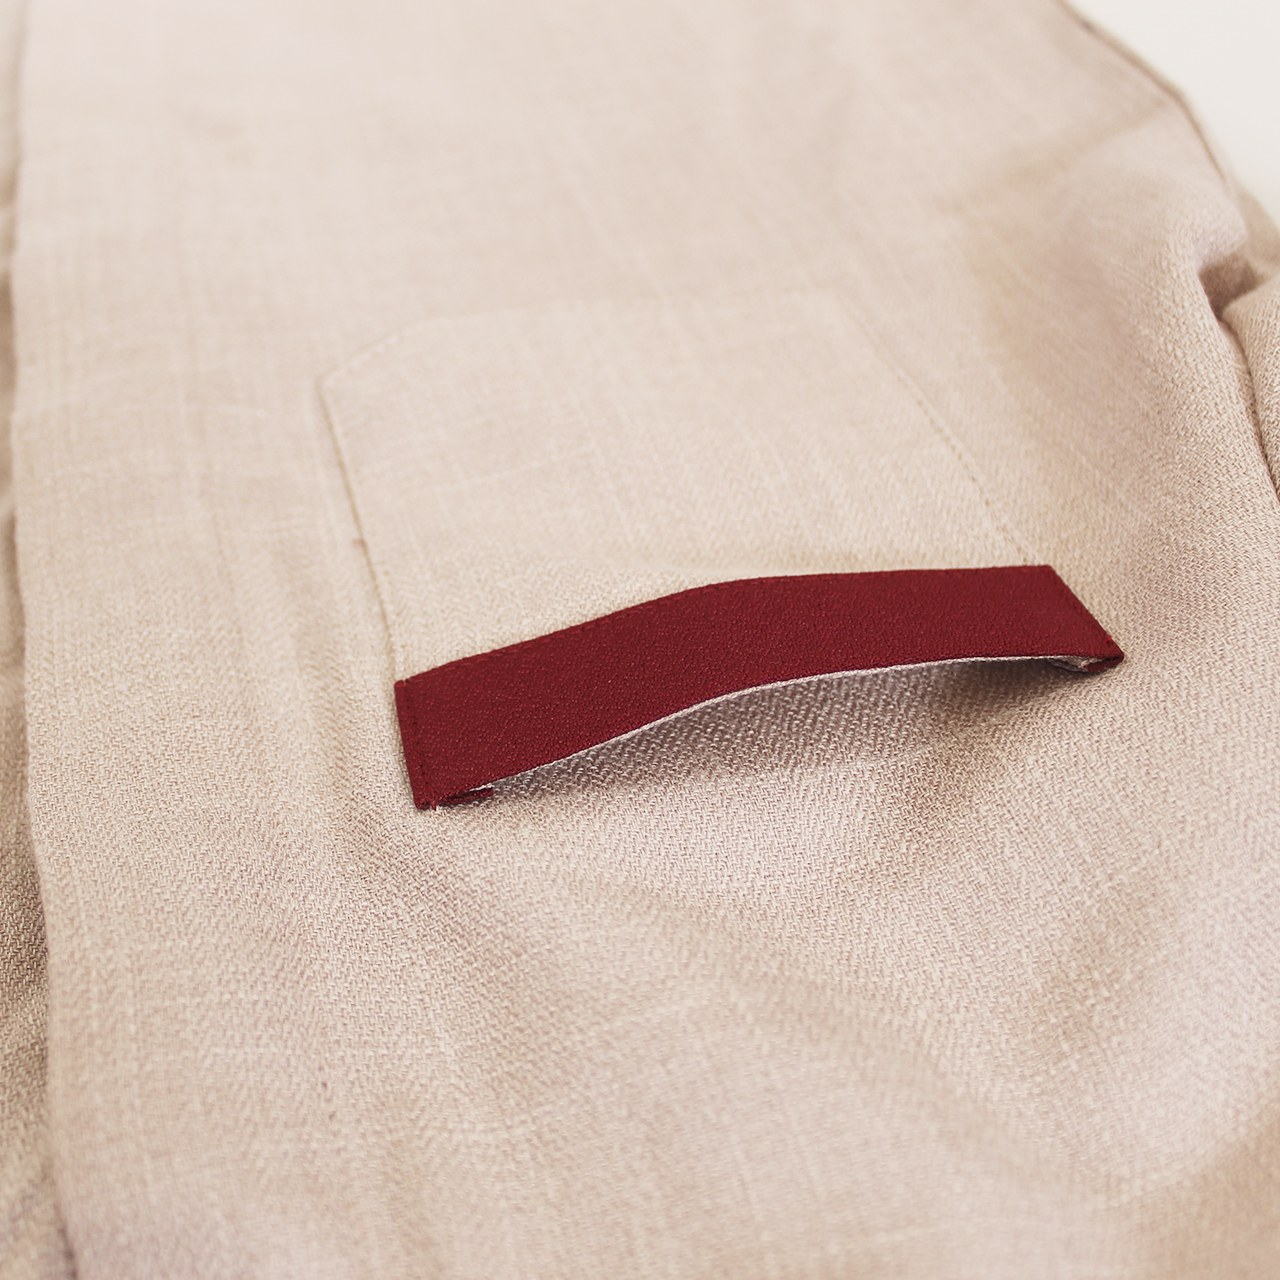 Design Baju Lebaran Dewasa Tqd3 Sarimbit Baju Lebaran Anak Dewasa Iac Baju Koko orlin Ayah